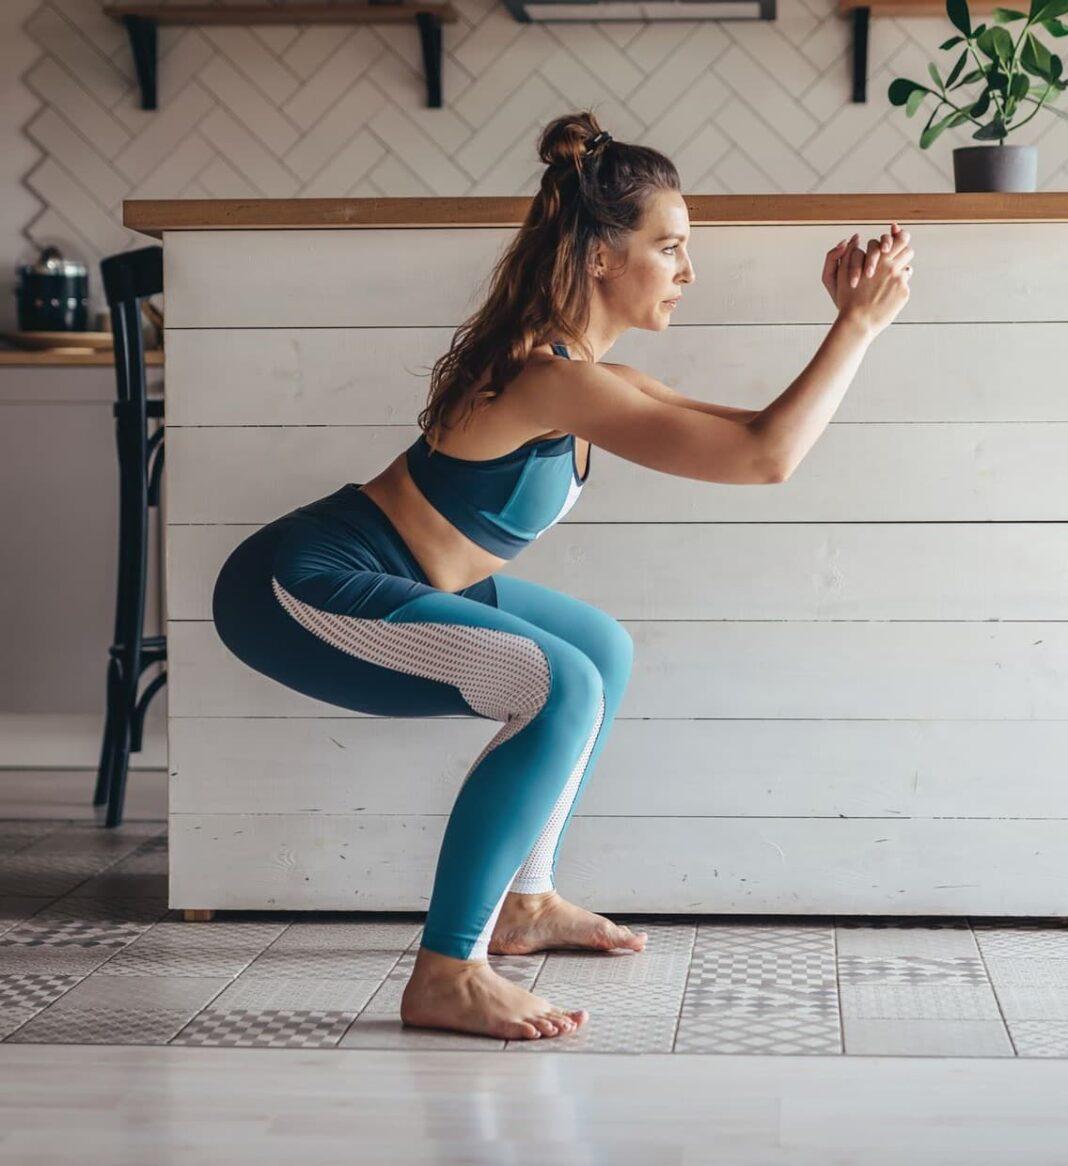 a woman doing a squat